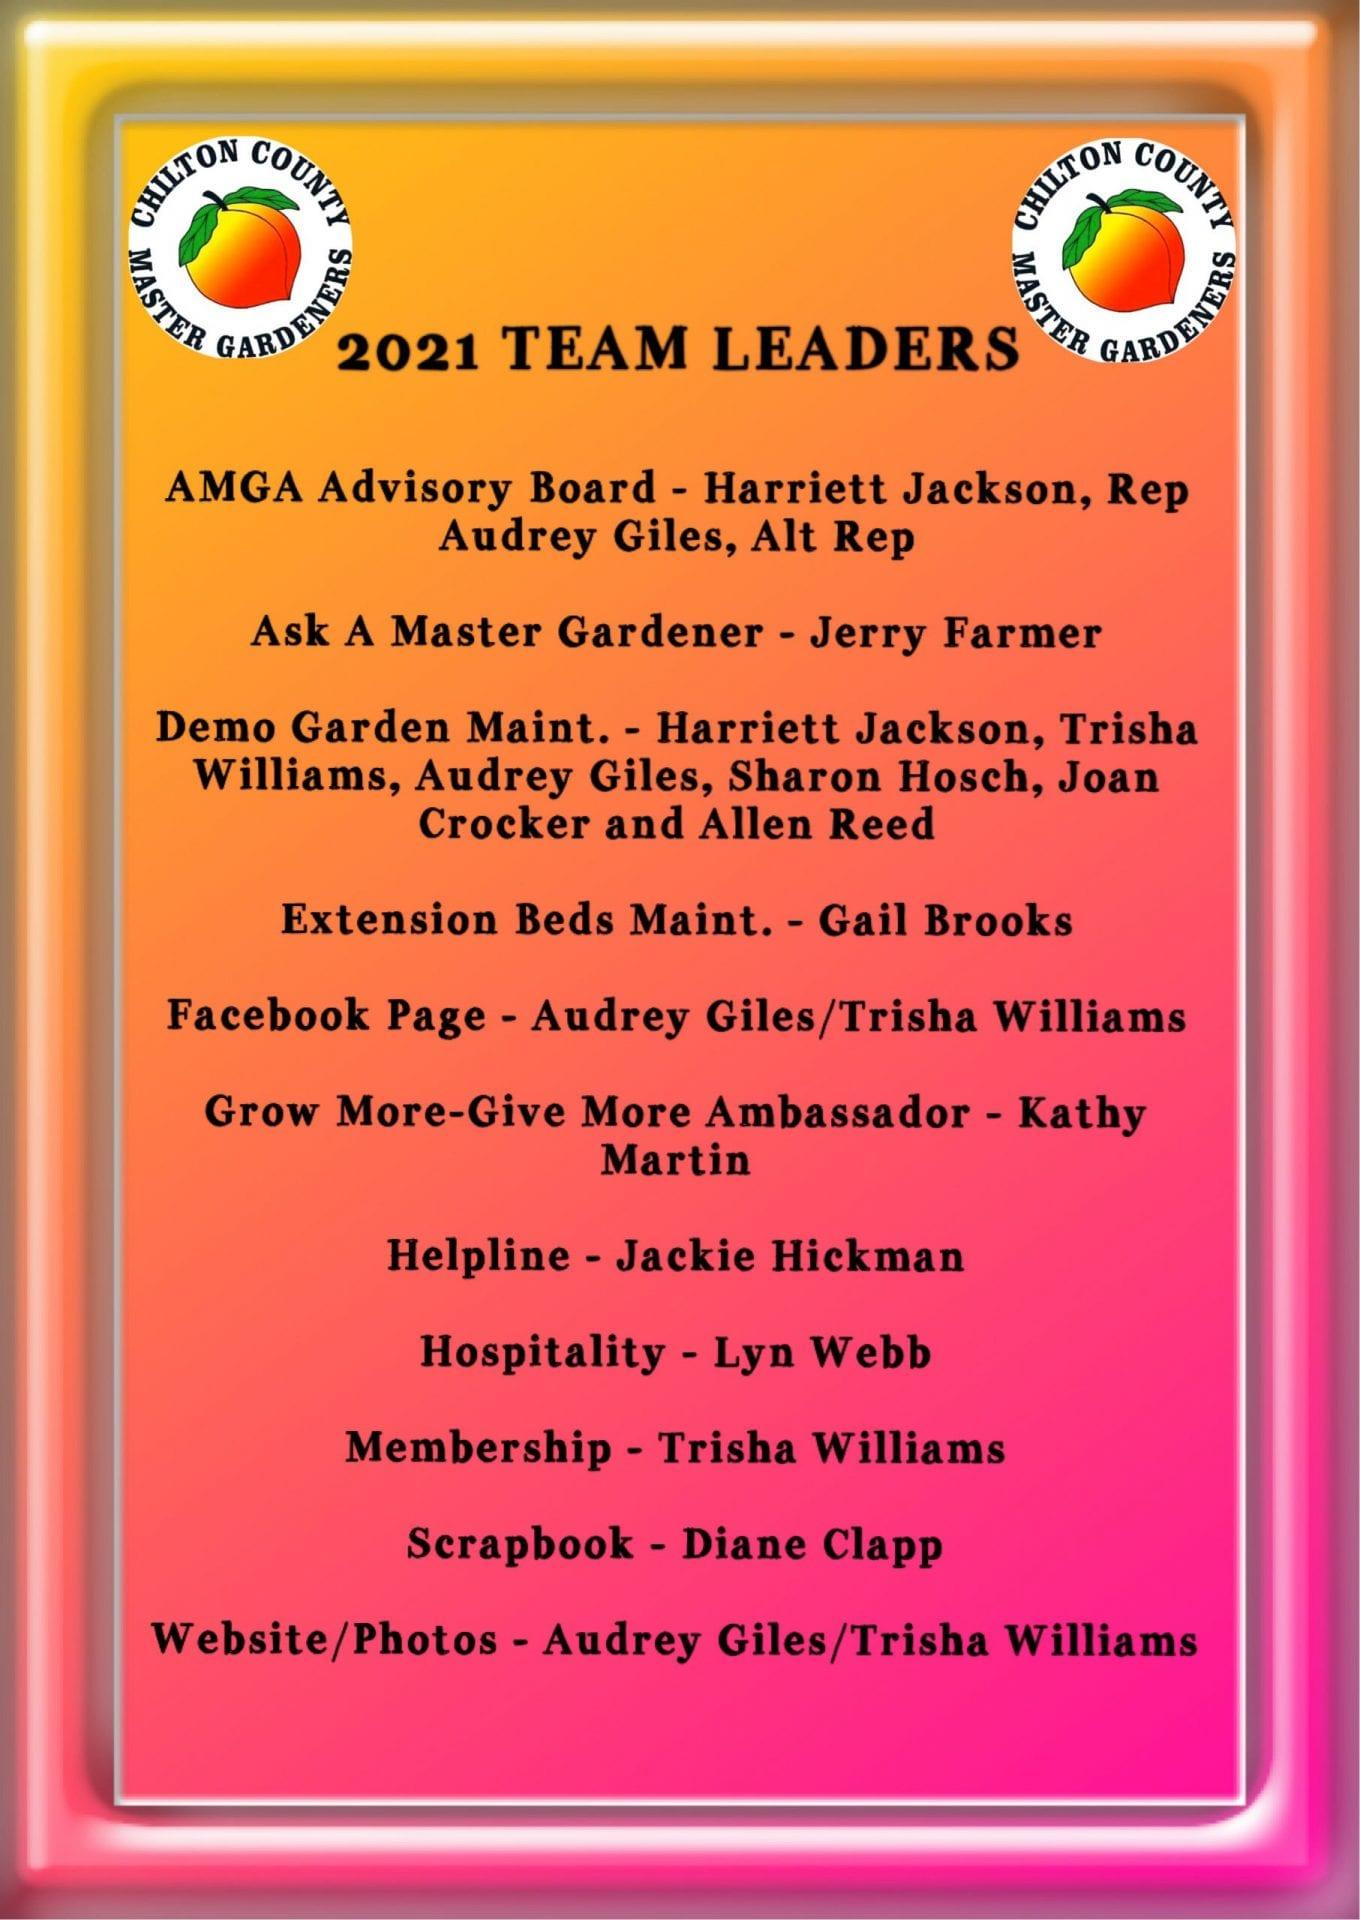 Team leaders 2021